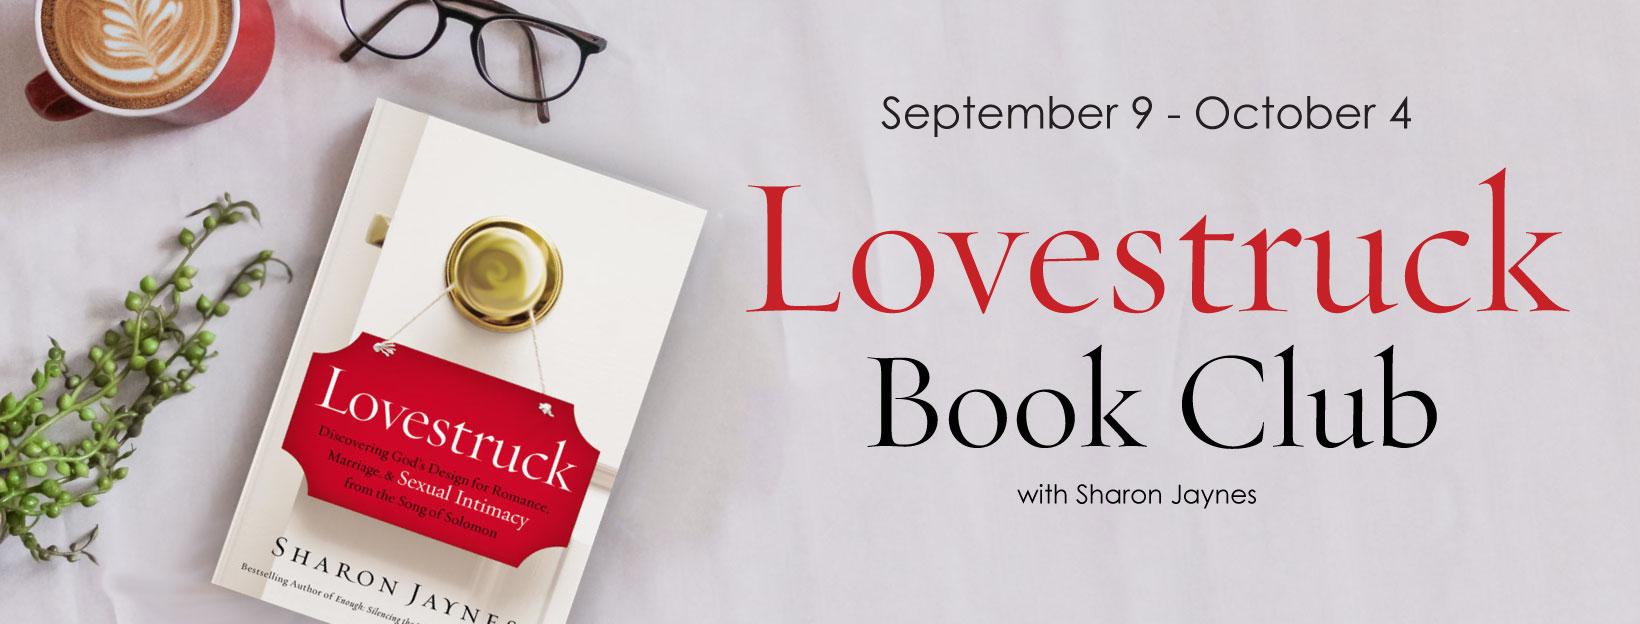 Lovestruck Book Club